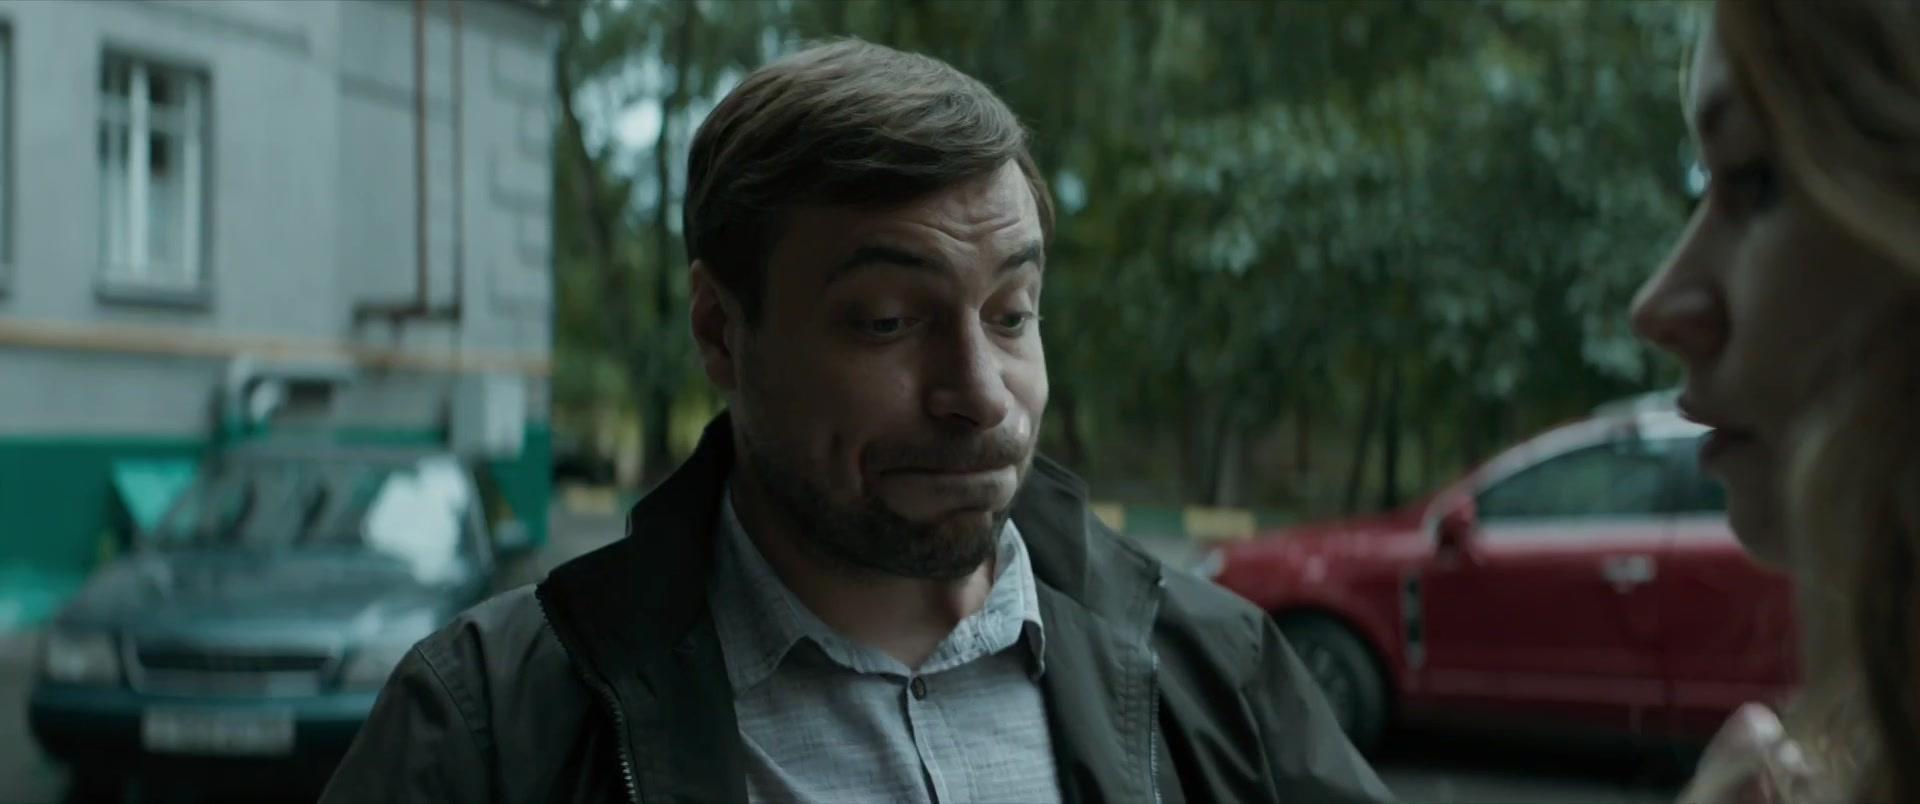 Мини сериалы Онлайн | Смотреть Русские Мини сериалы 2017 ...